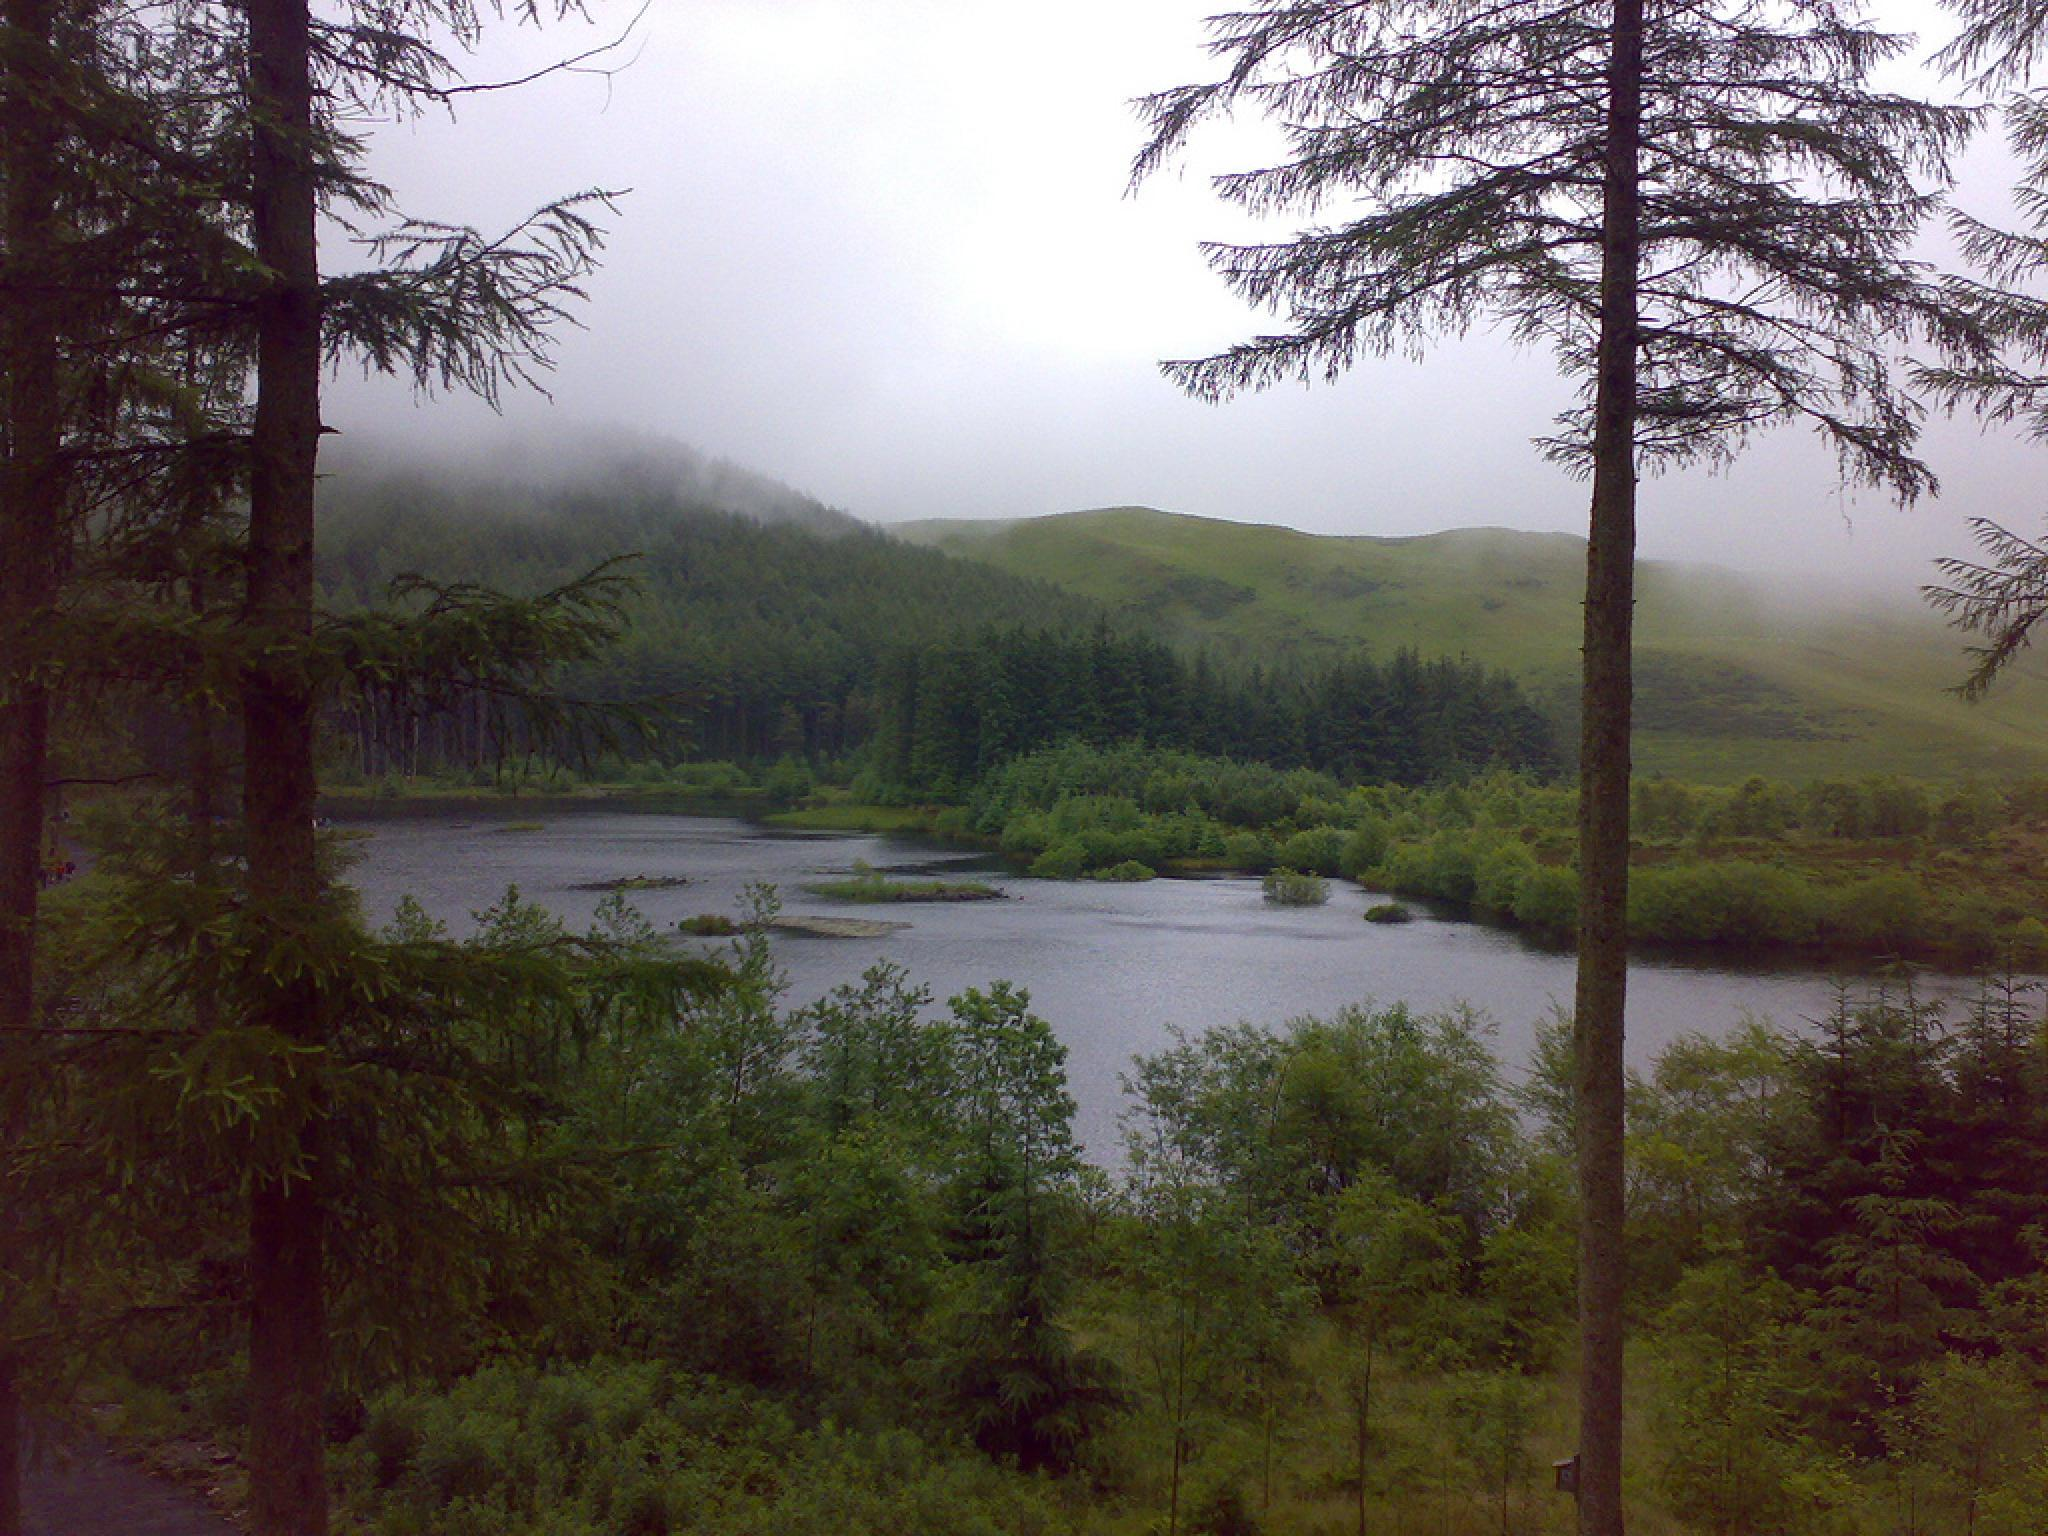 Morning Mist by Aligeeach